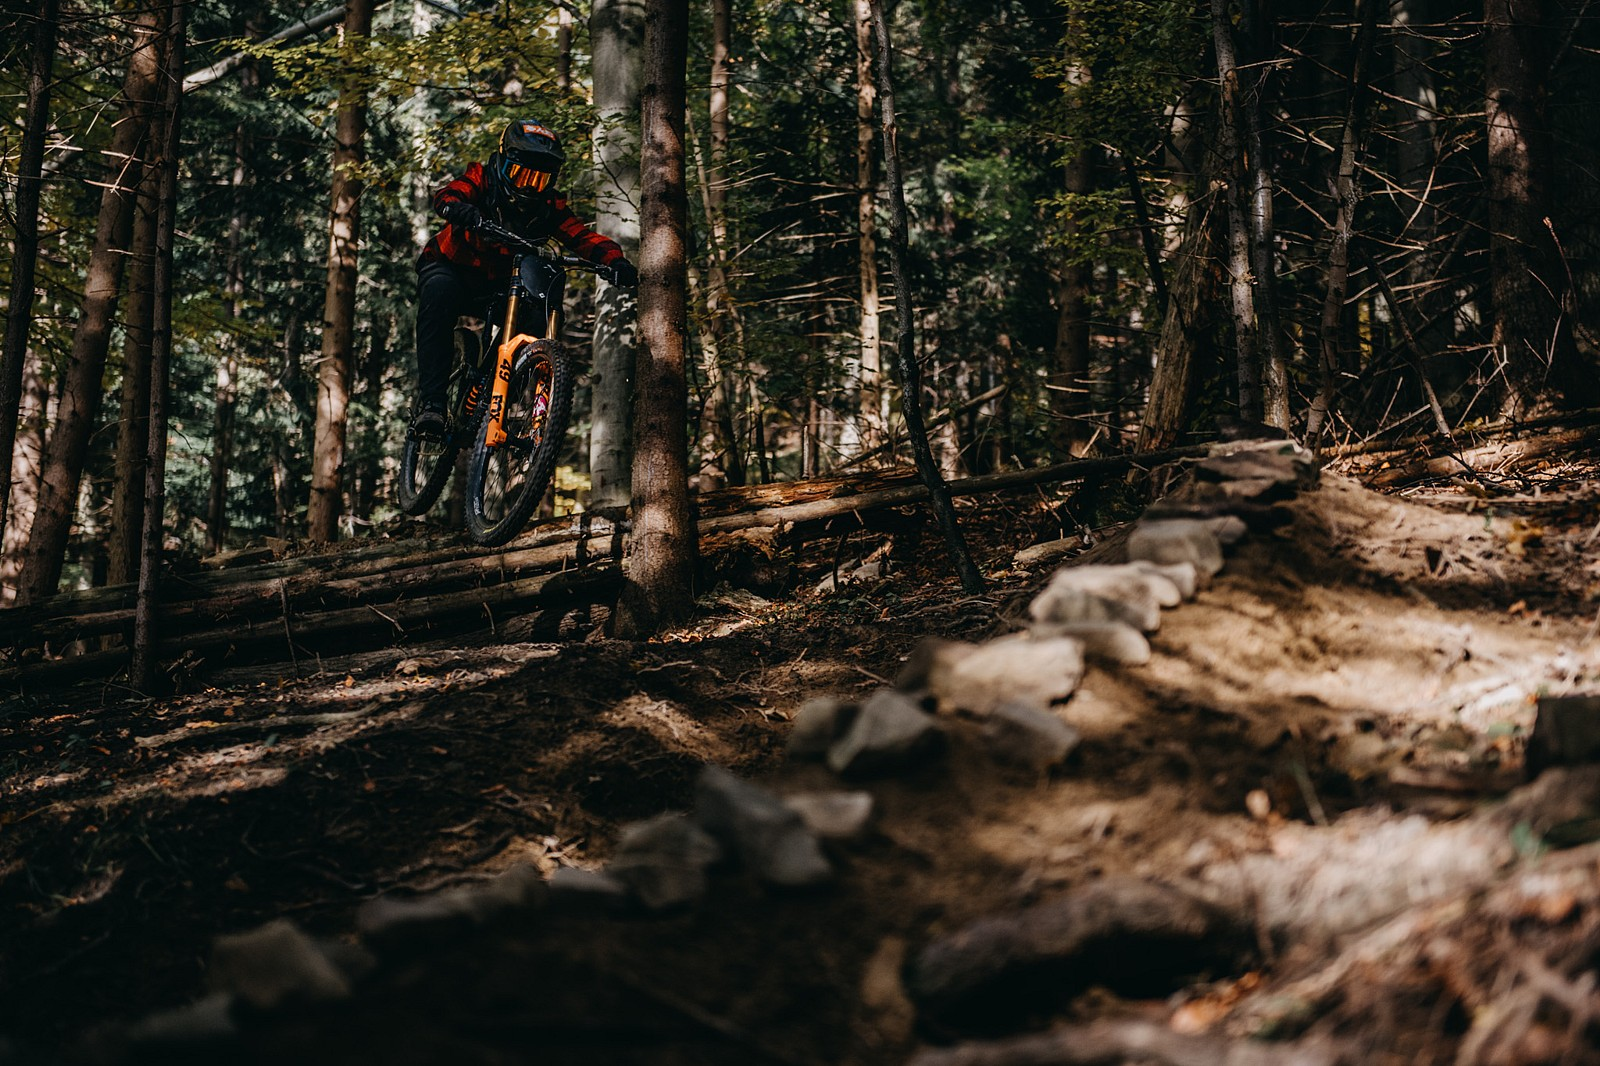 3C3ABDB9-2B00-4B02-866C-E070FEA1915D - Arczii95 - Mountain Biking Pictures - Vital MTB